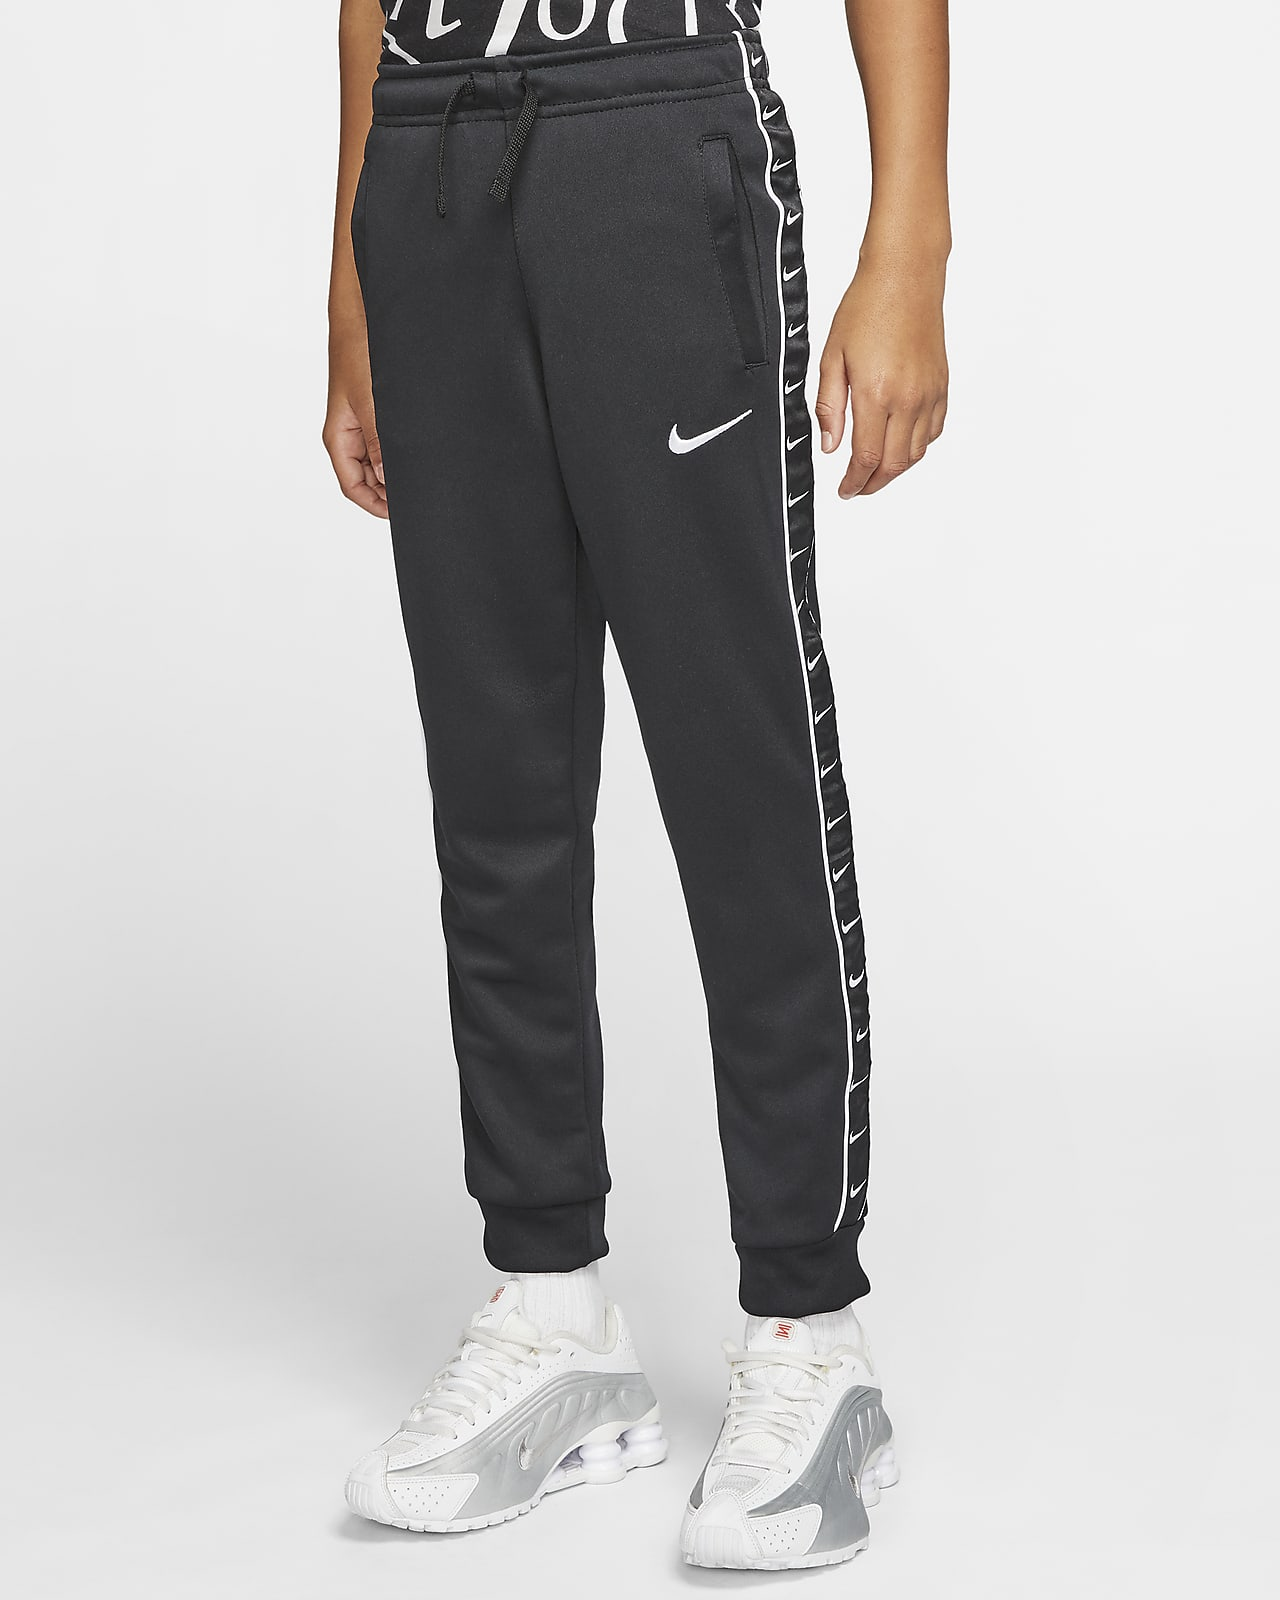 Джоггеры для школьников Nike Sportswear Swoosh